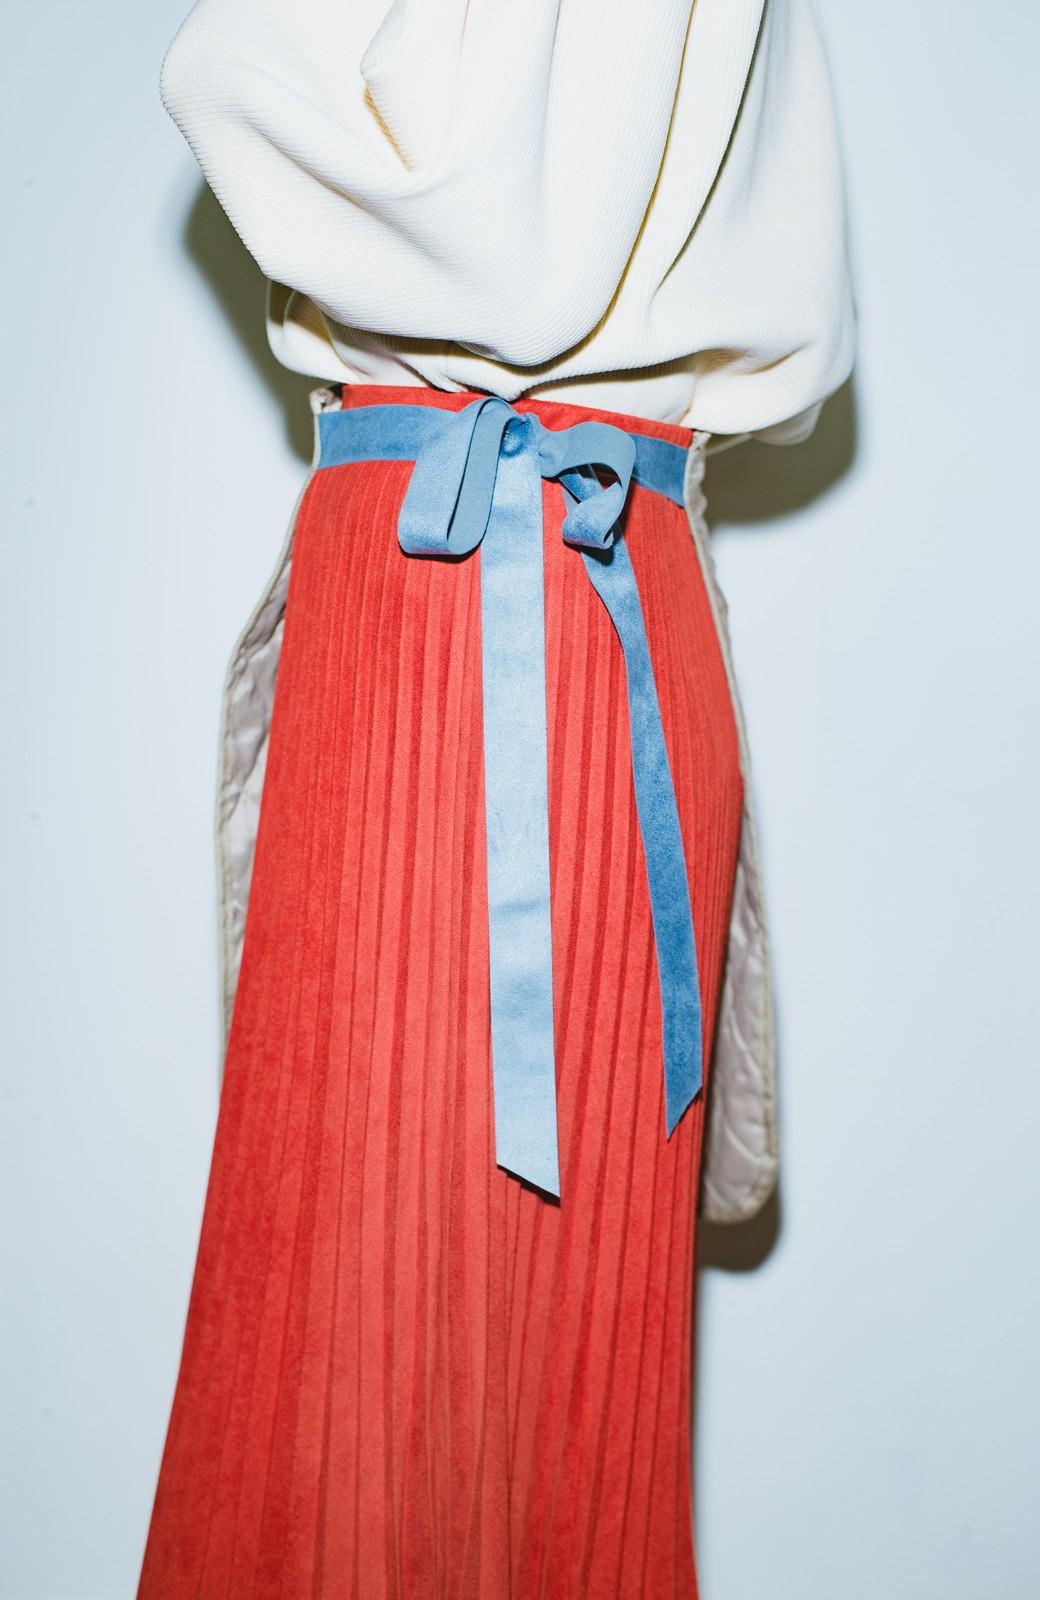 haco! haco! × RBTXCO  着回したっくさん!エプロン風巻きスカート <オレンジ系その他>の商品写真7